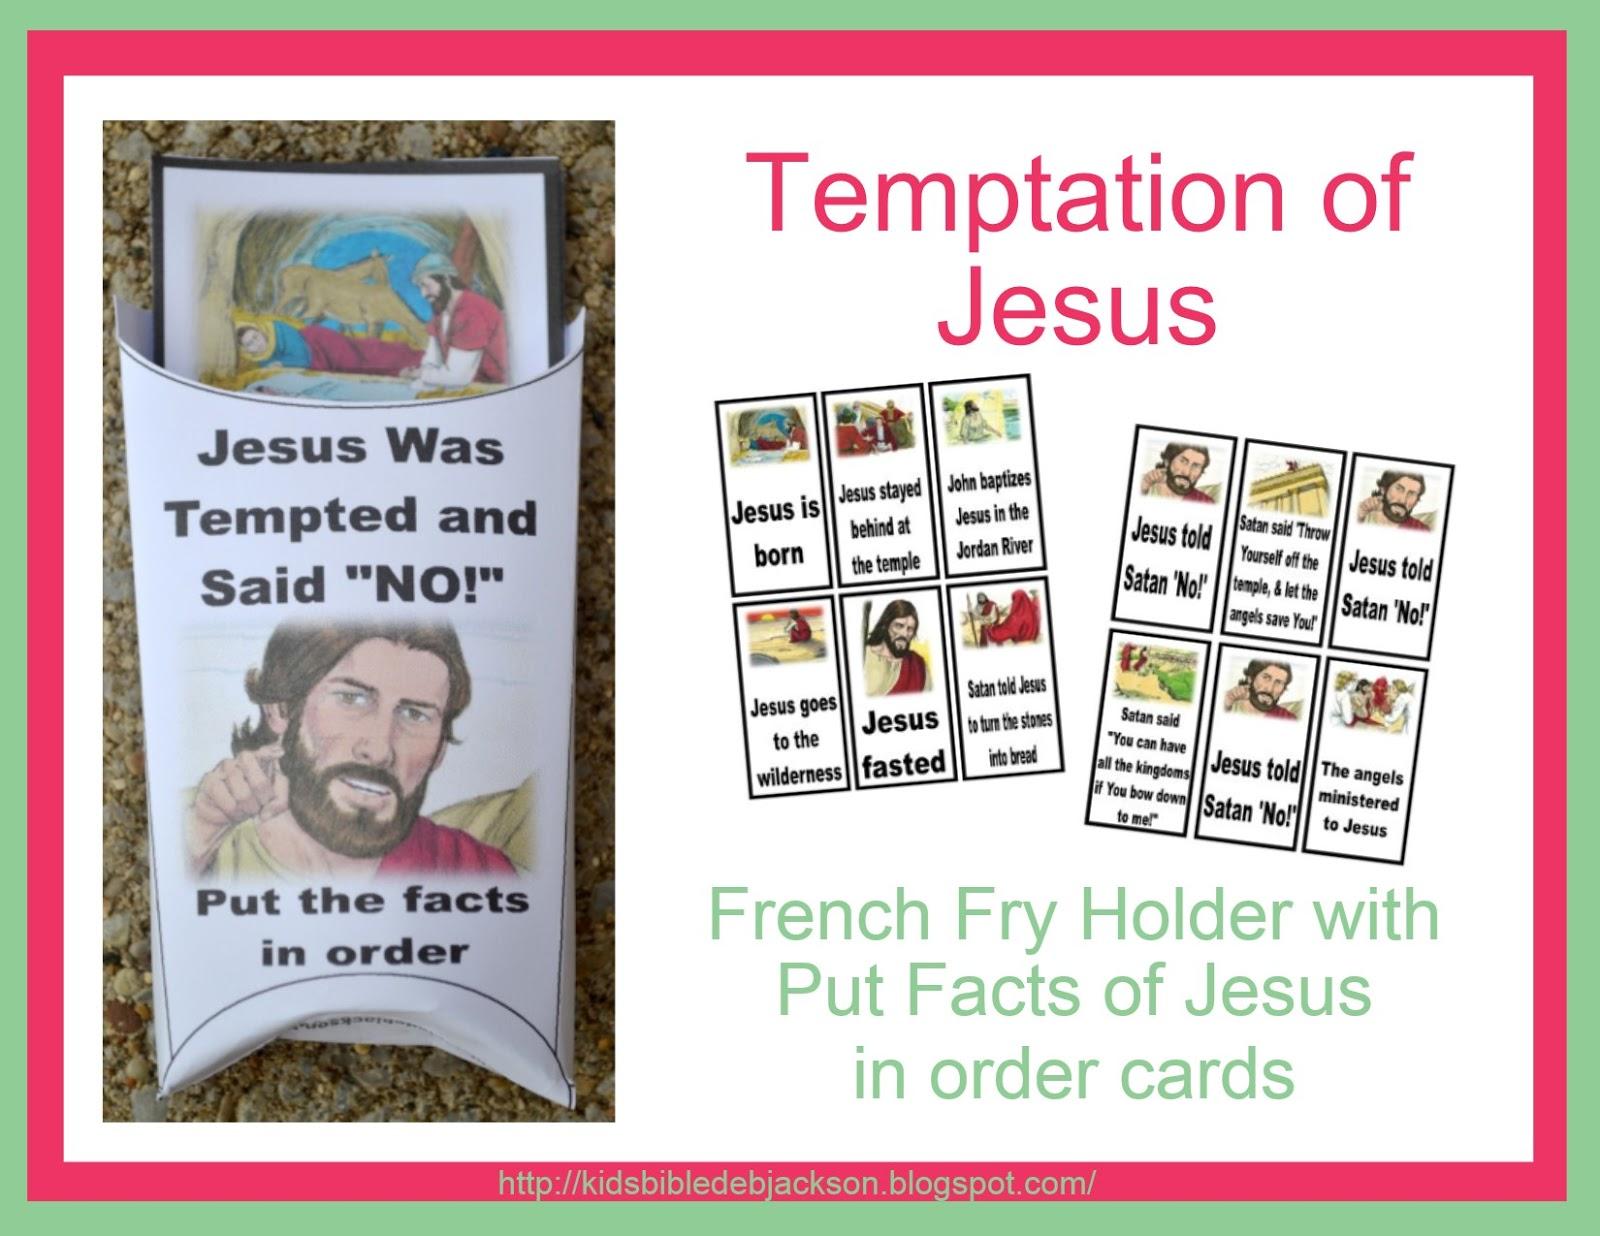 http://kidsbibledebjackson.blogspot.com/2014/07/temptation-of-jesus.html